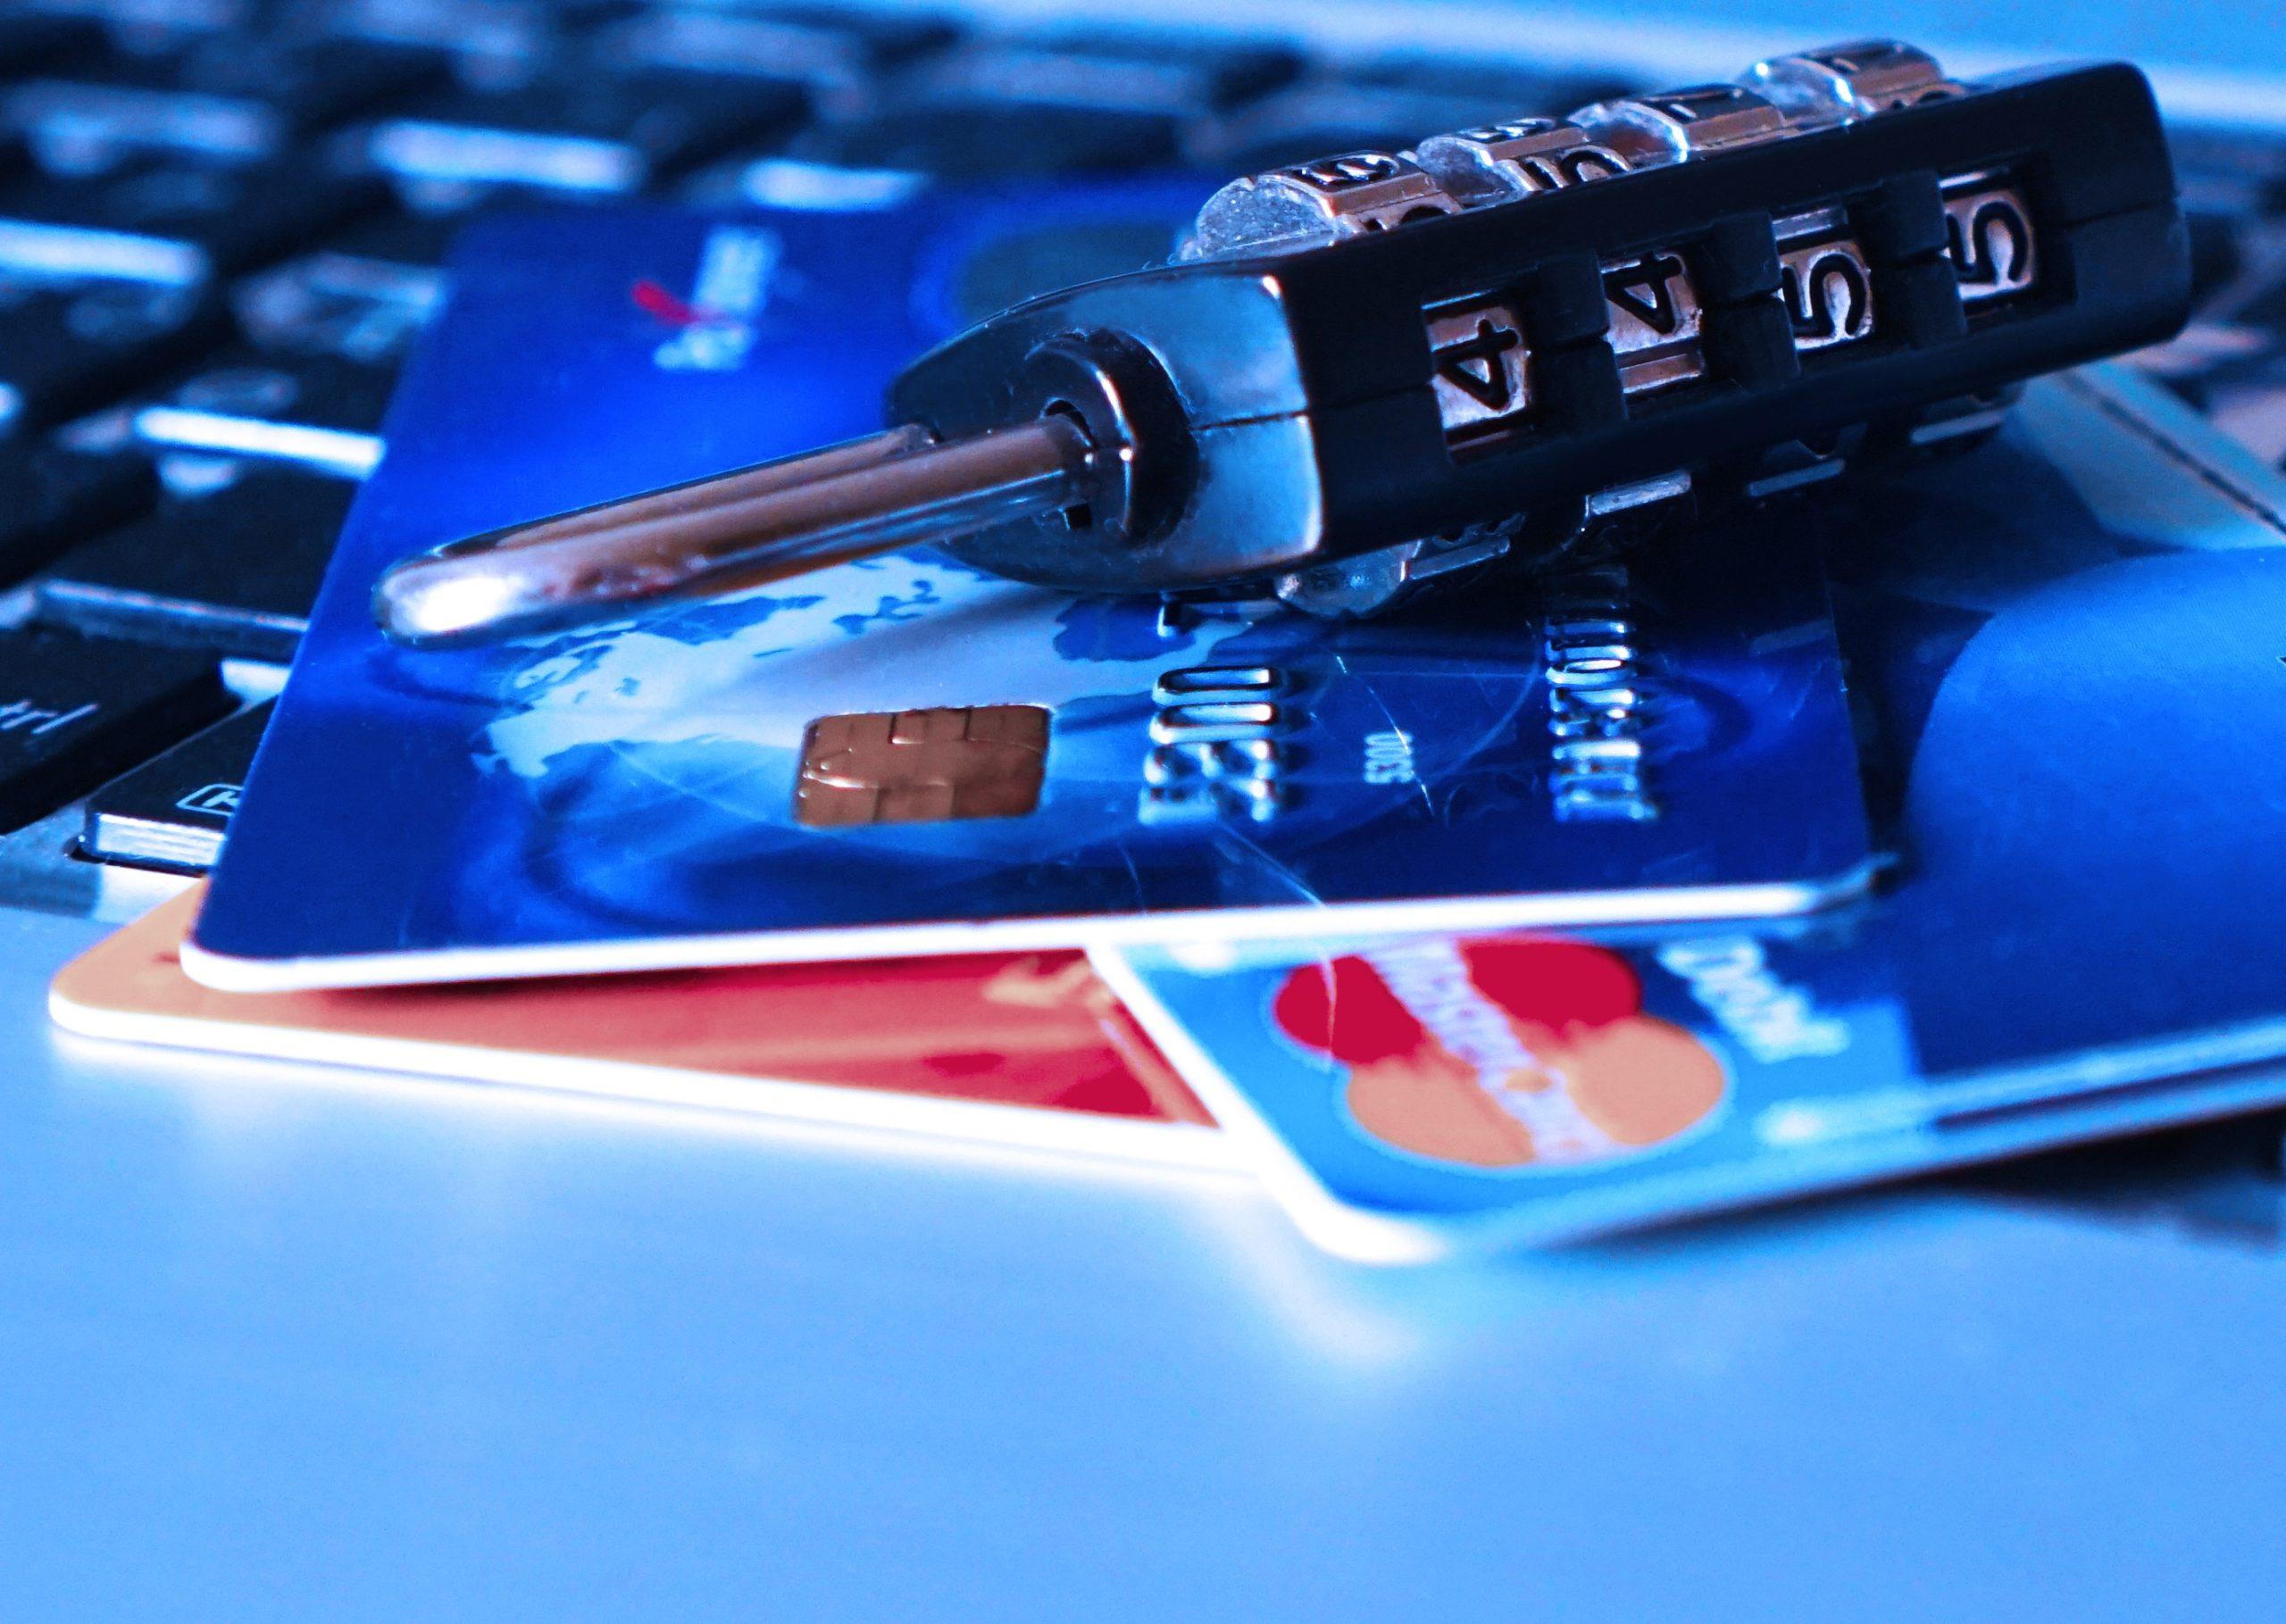 fraude, datos, CIBANCO, protección de datos